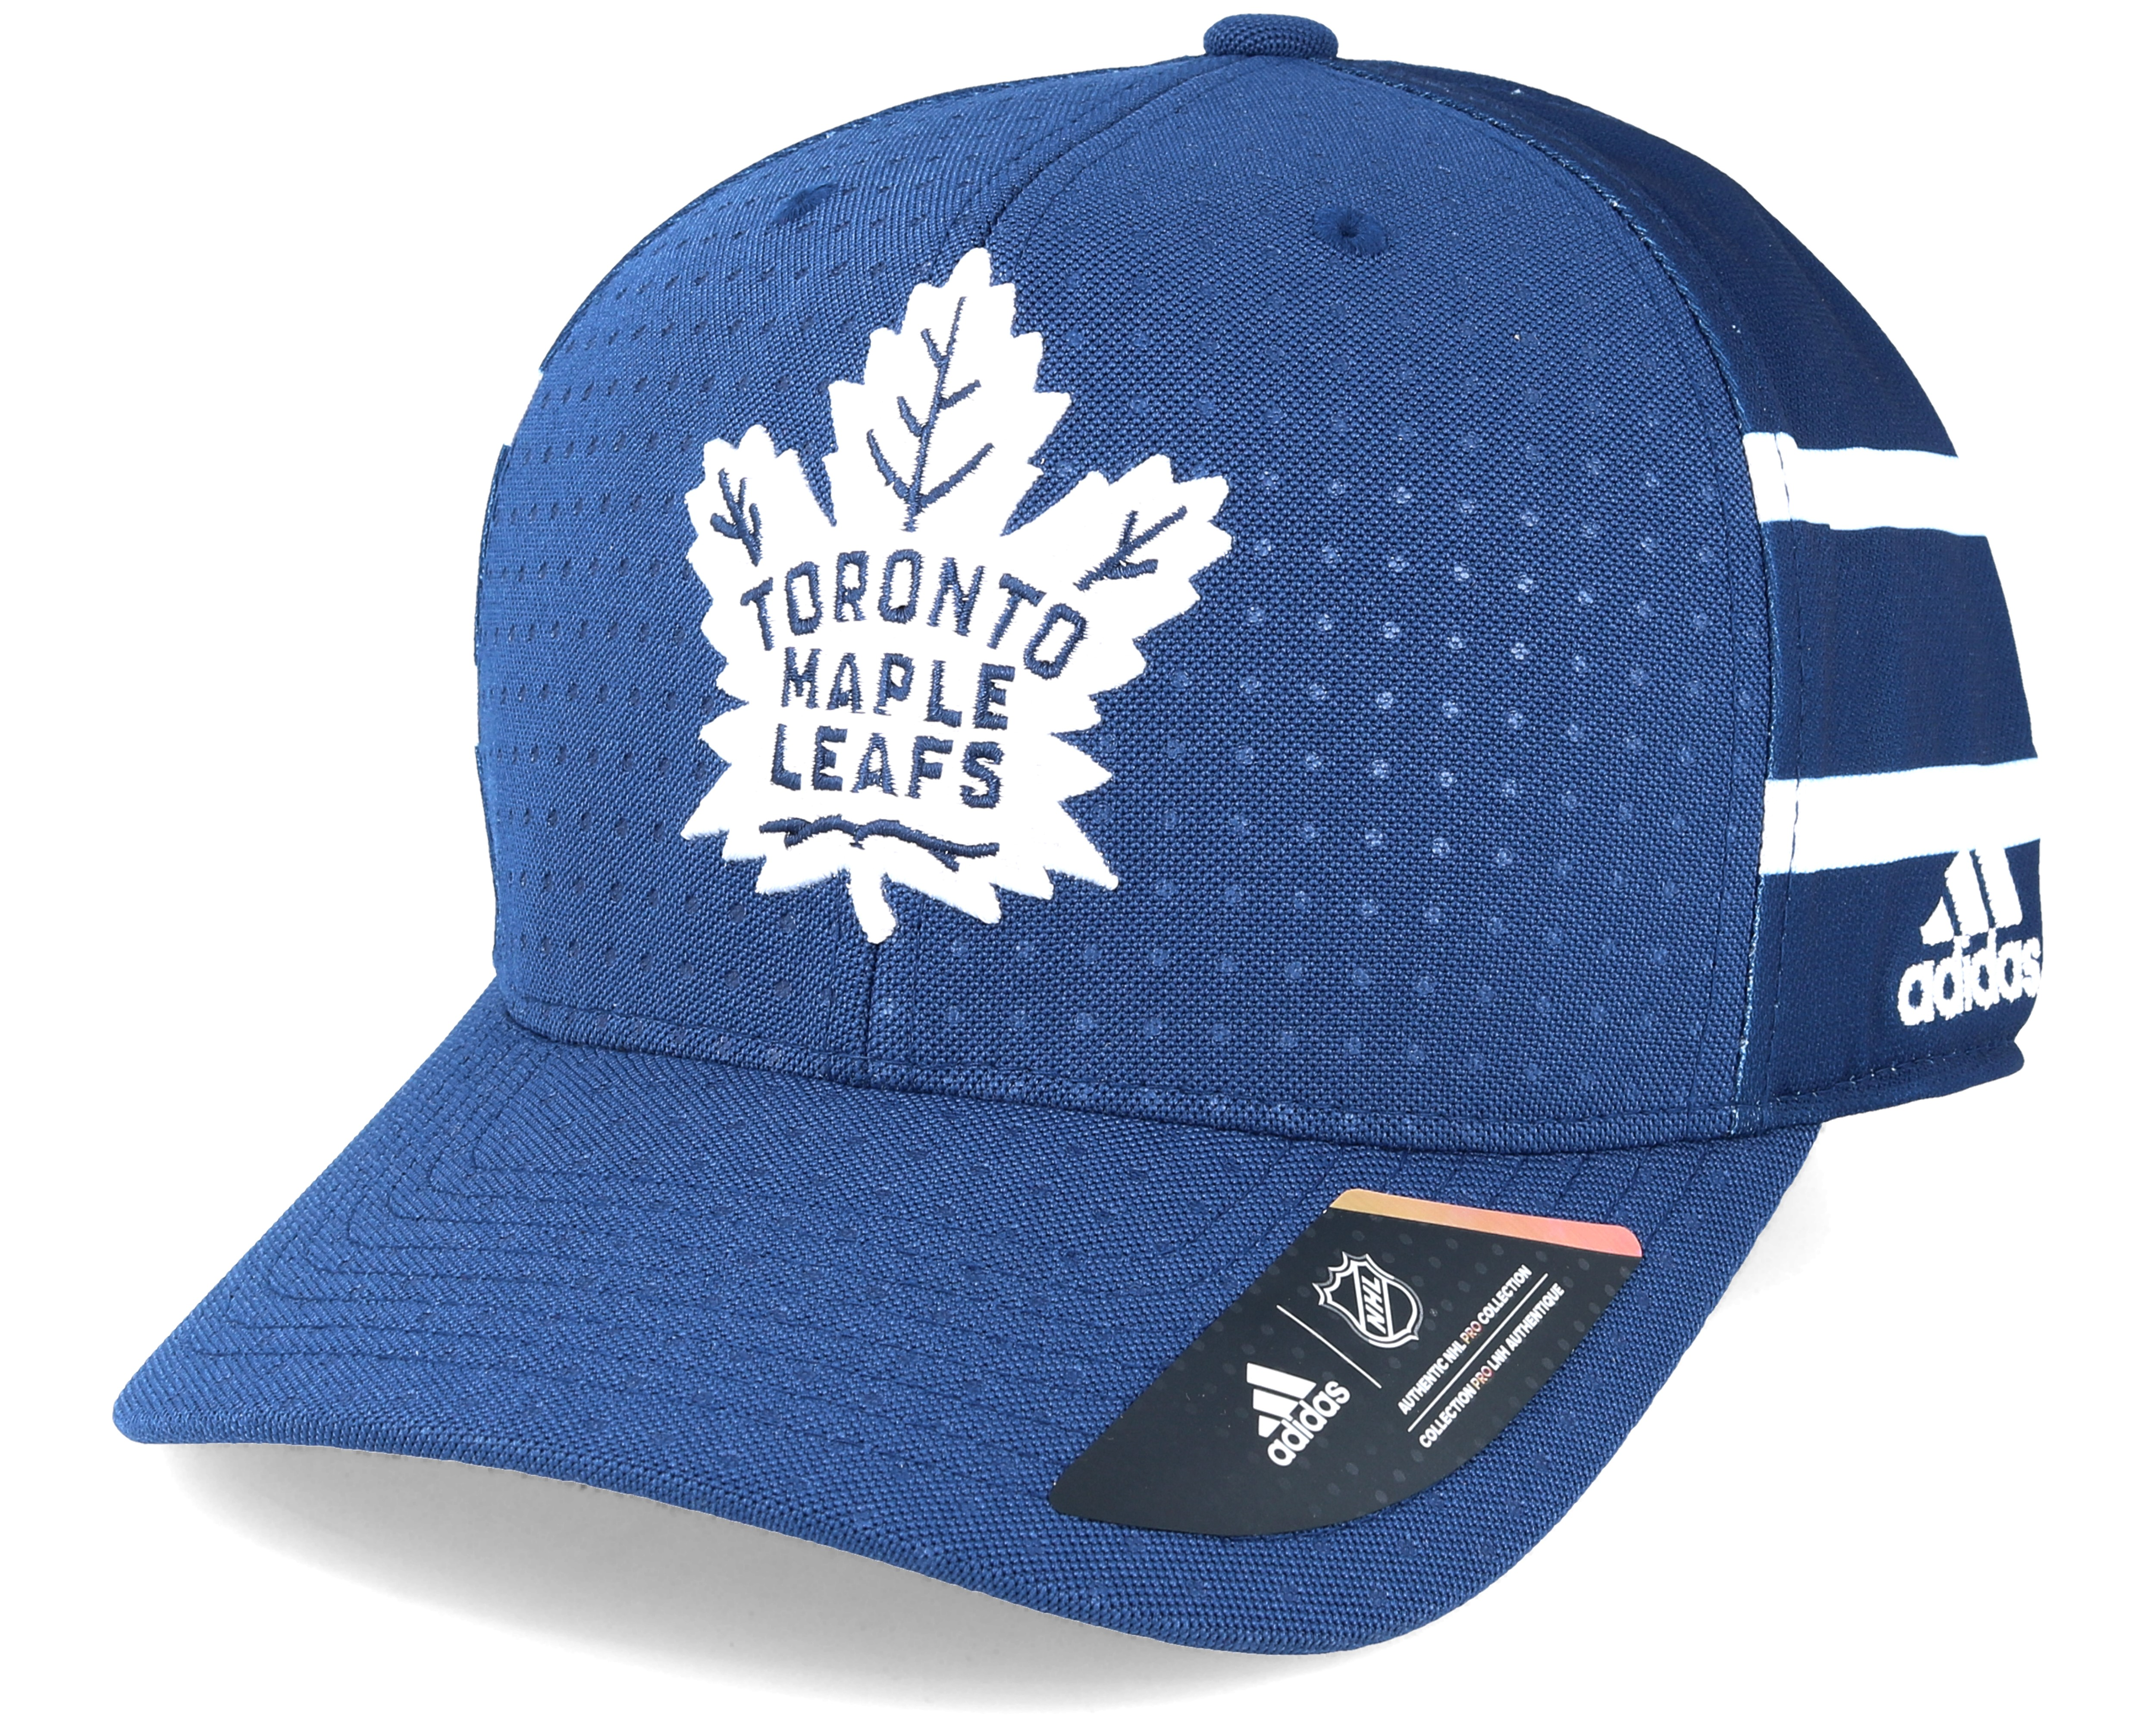 Toronto Maple Leafs Draft Structured Blue Flexfit Adidas